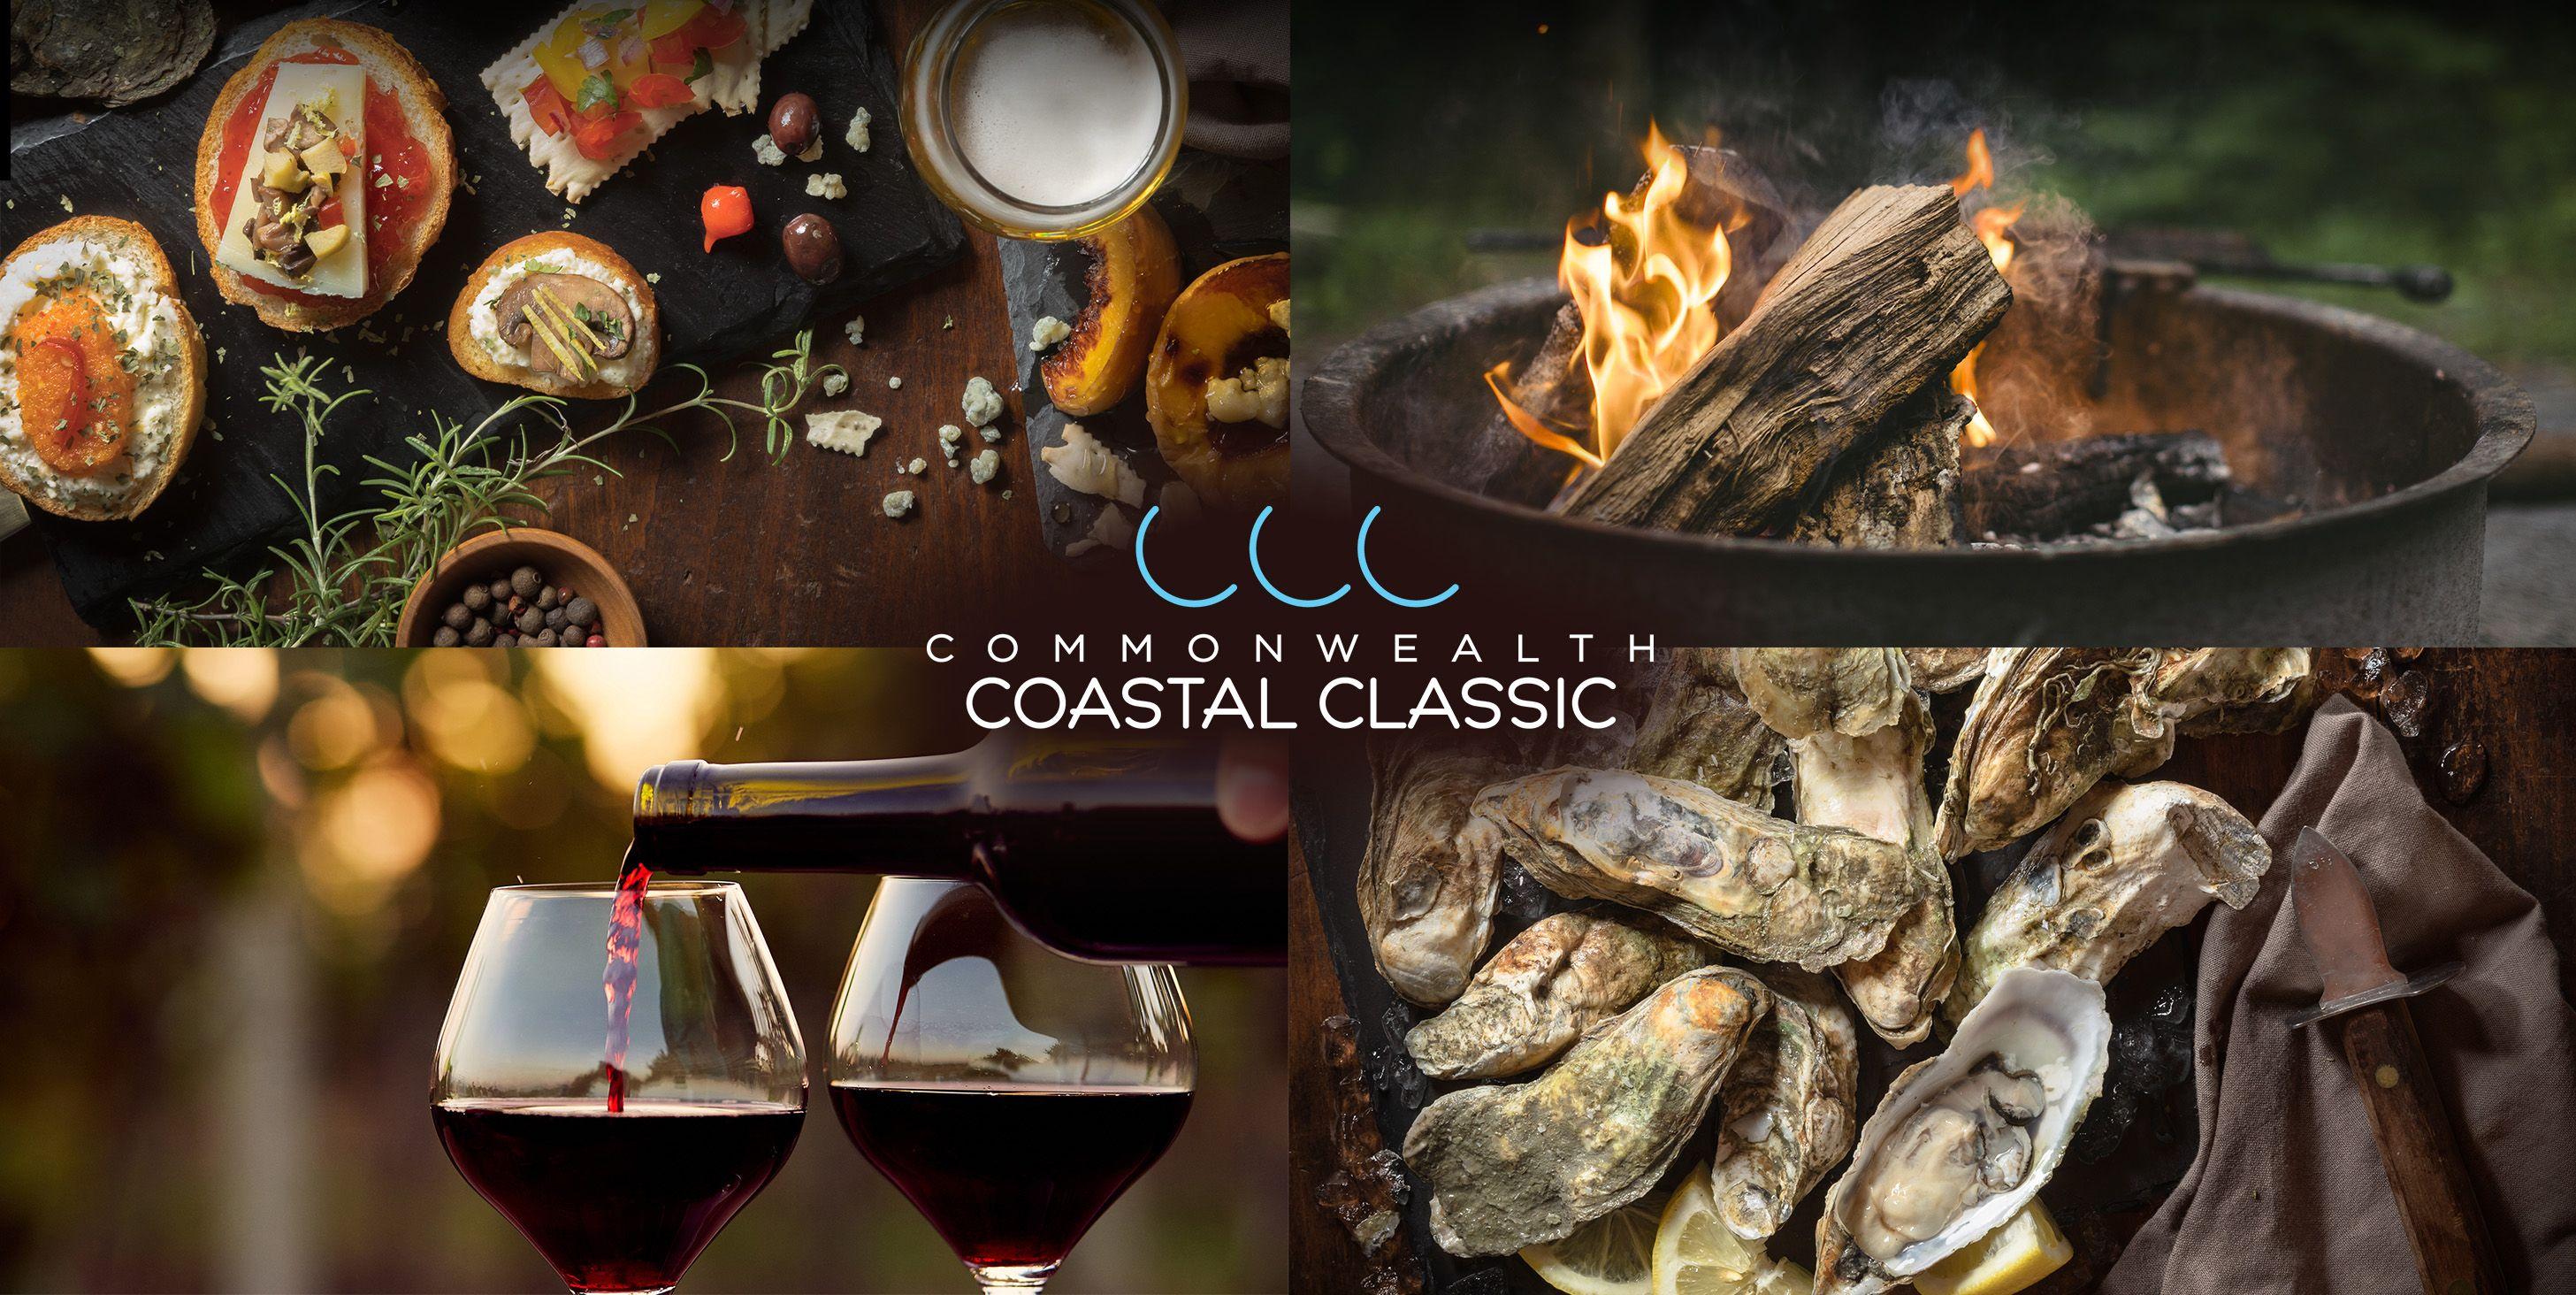 Commonwealth Coastal Classic image